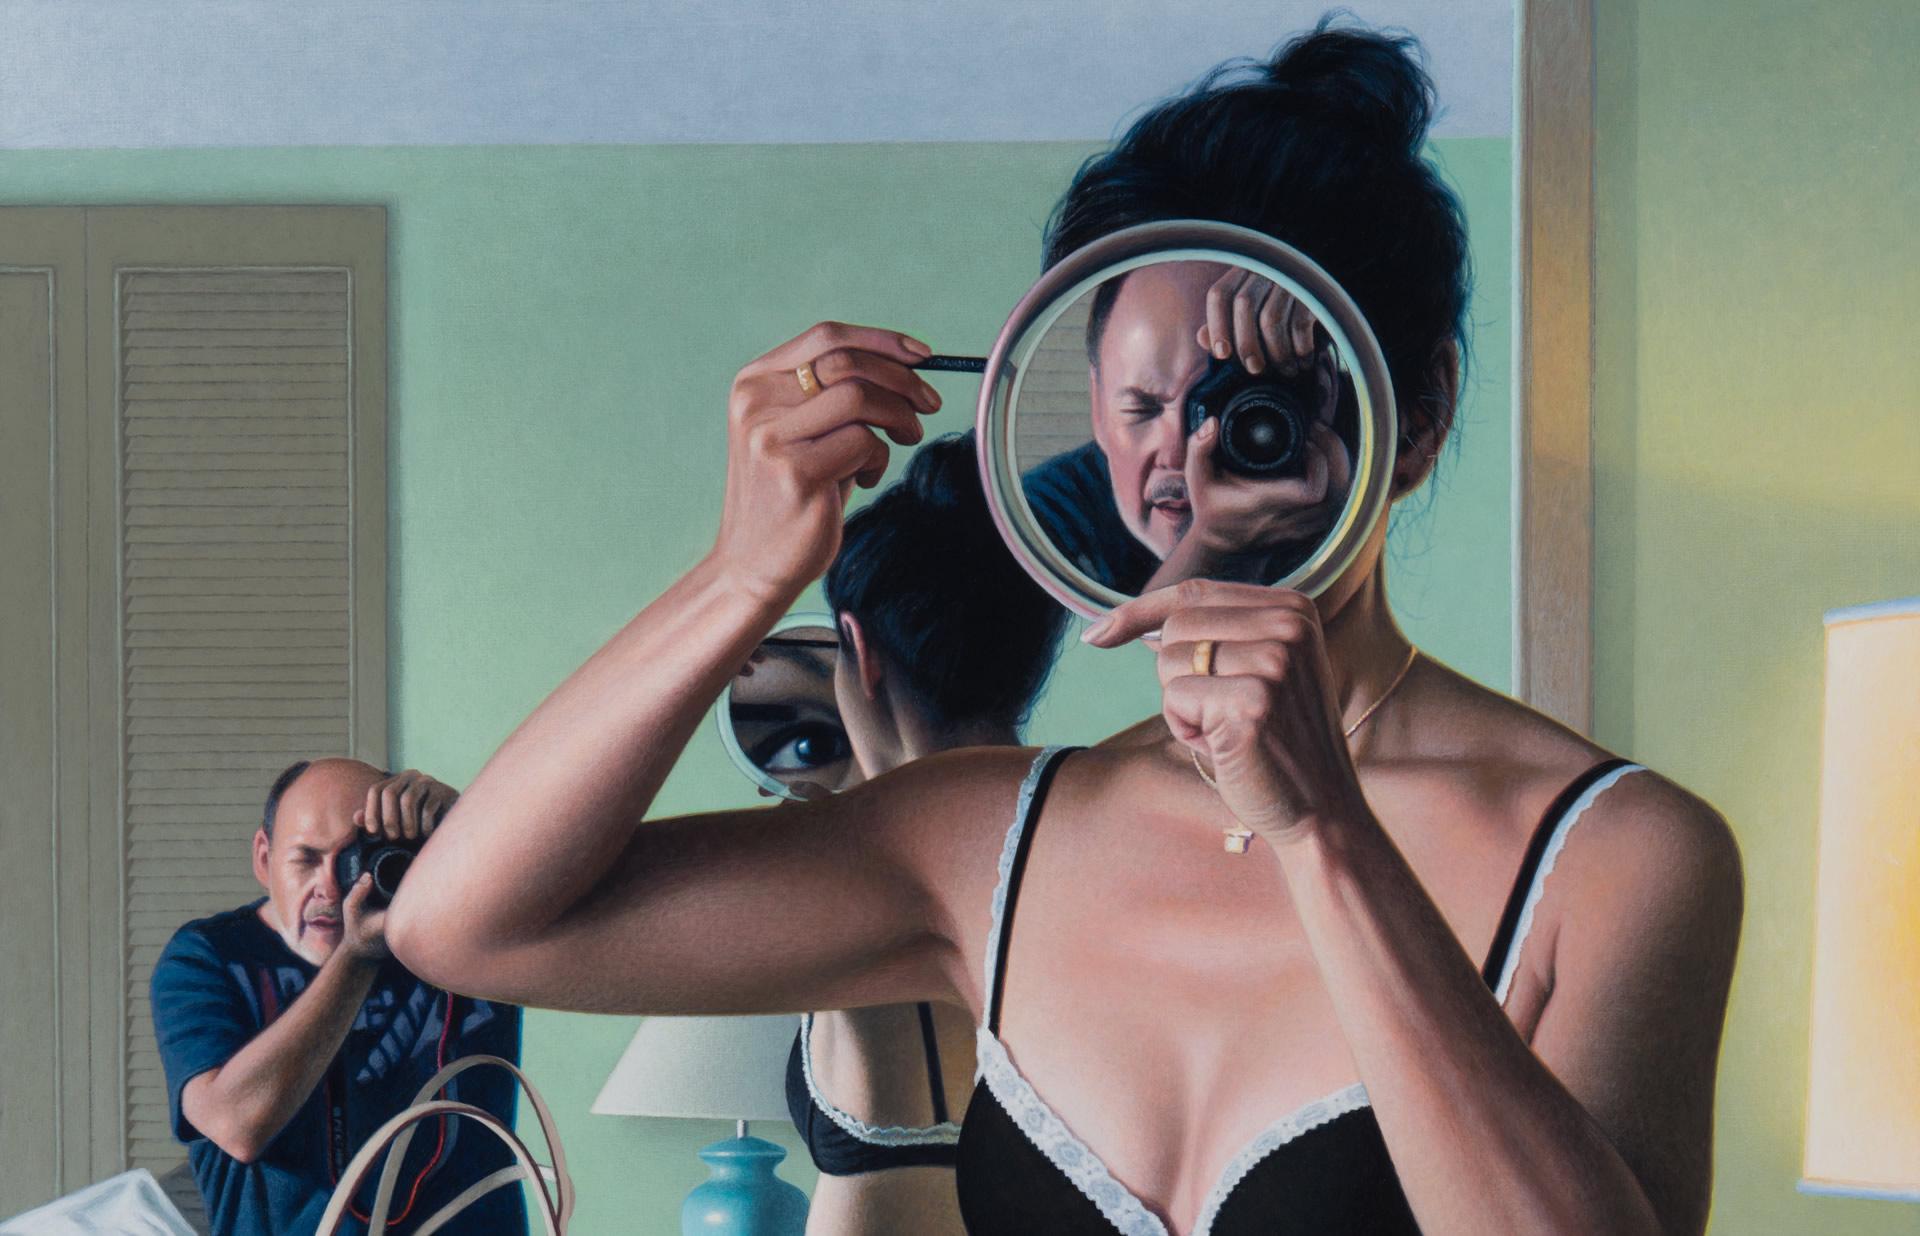 Andrew-Valko-Shutterbug-2021-Archival-Pigment-Print-Backmounted-On-Aluminum-31x40-Online-Art-Galleries